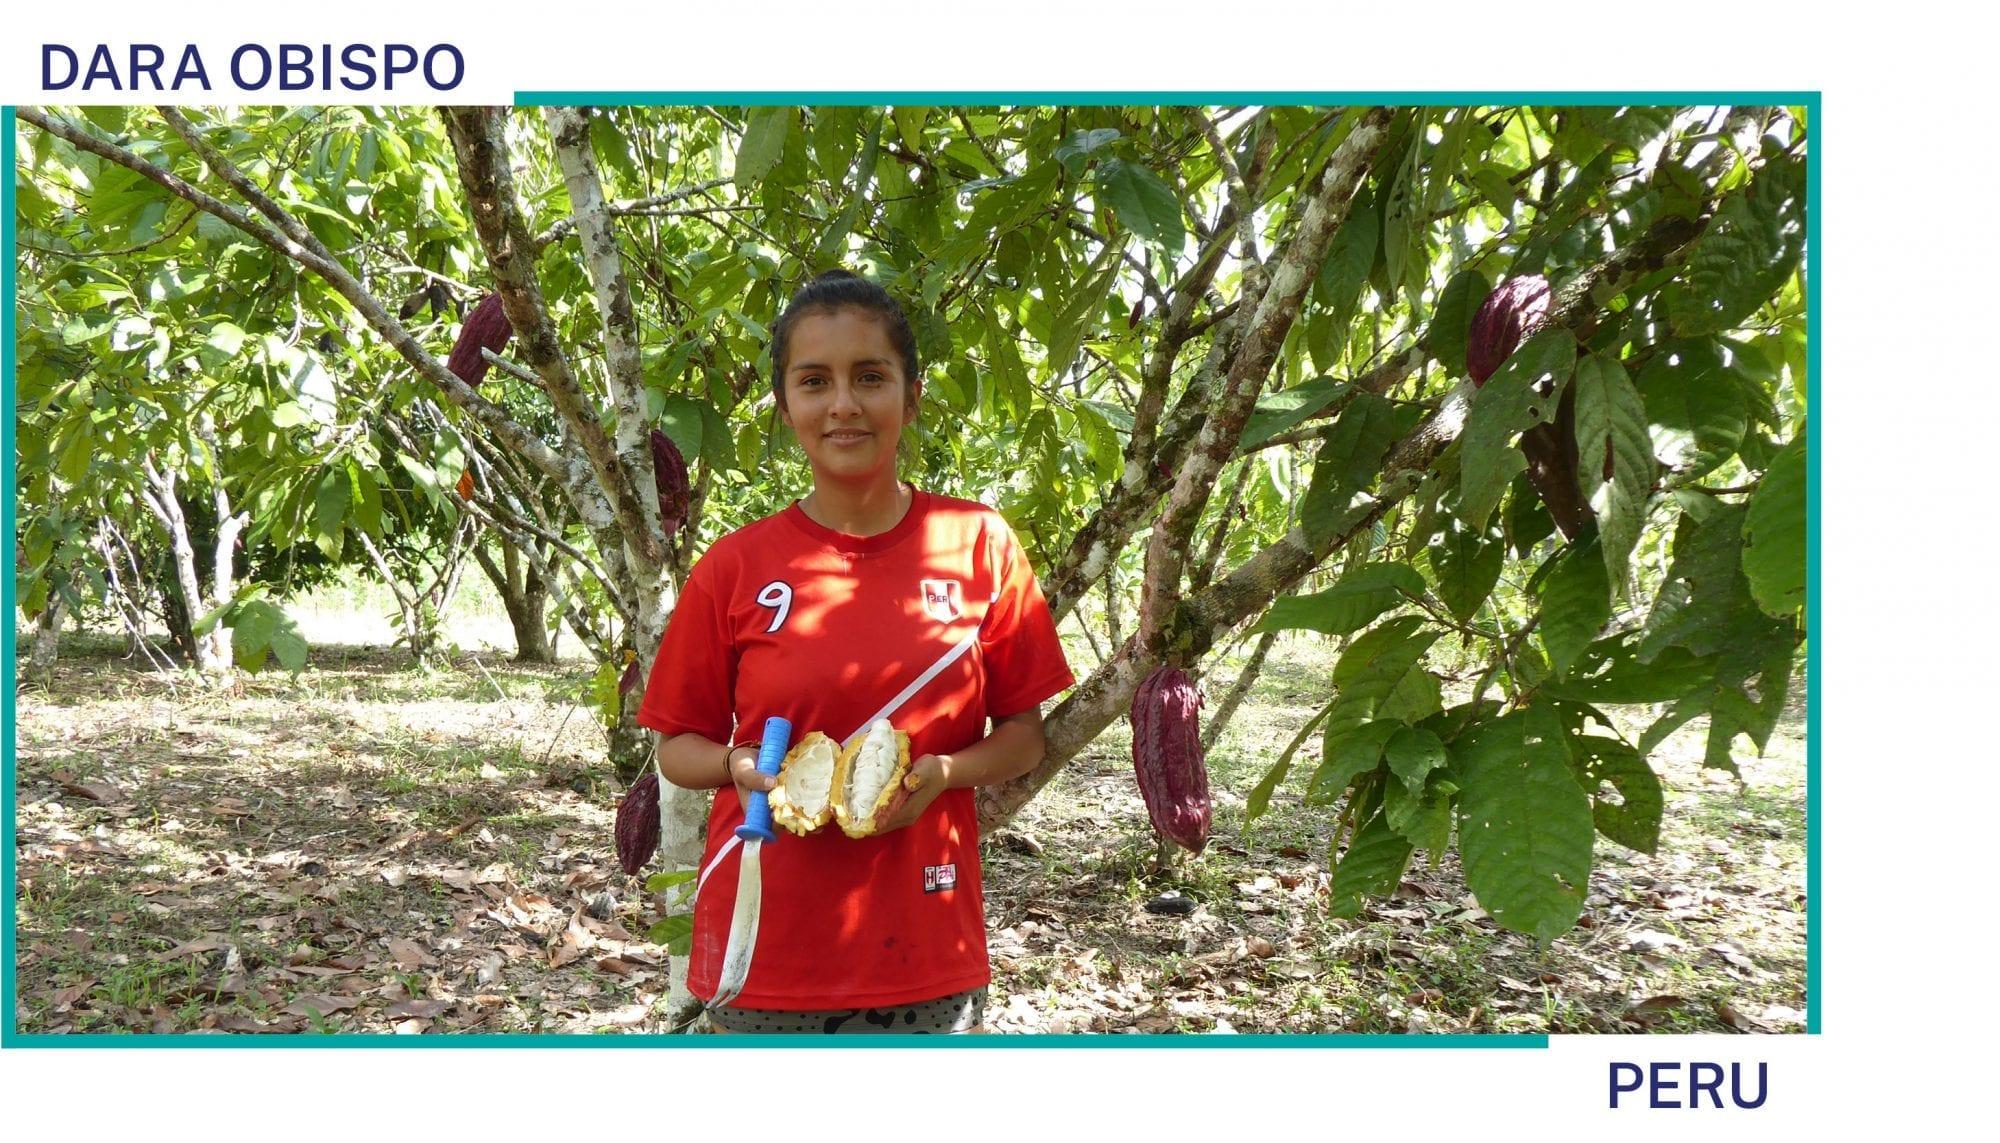 Dara Obispo stands on her cocoa farm in Peru